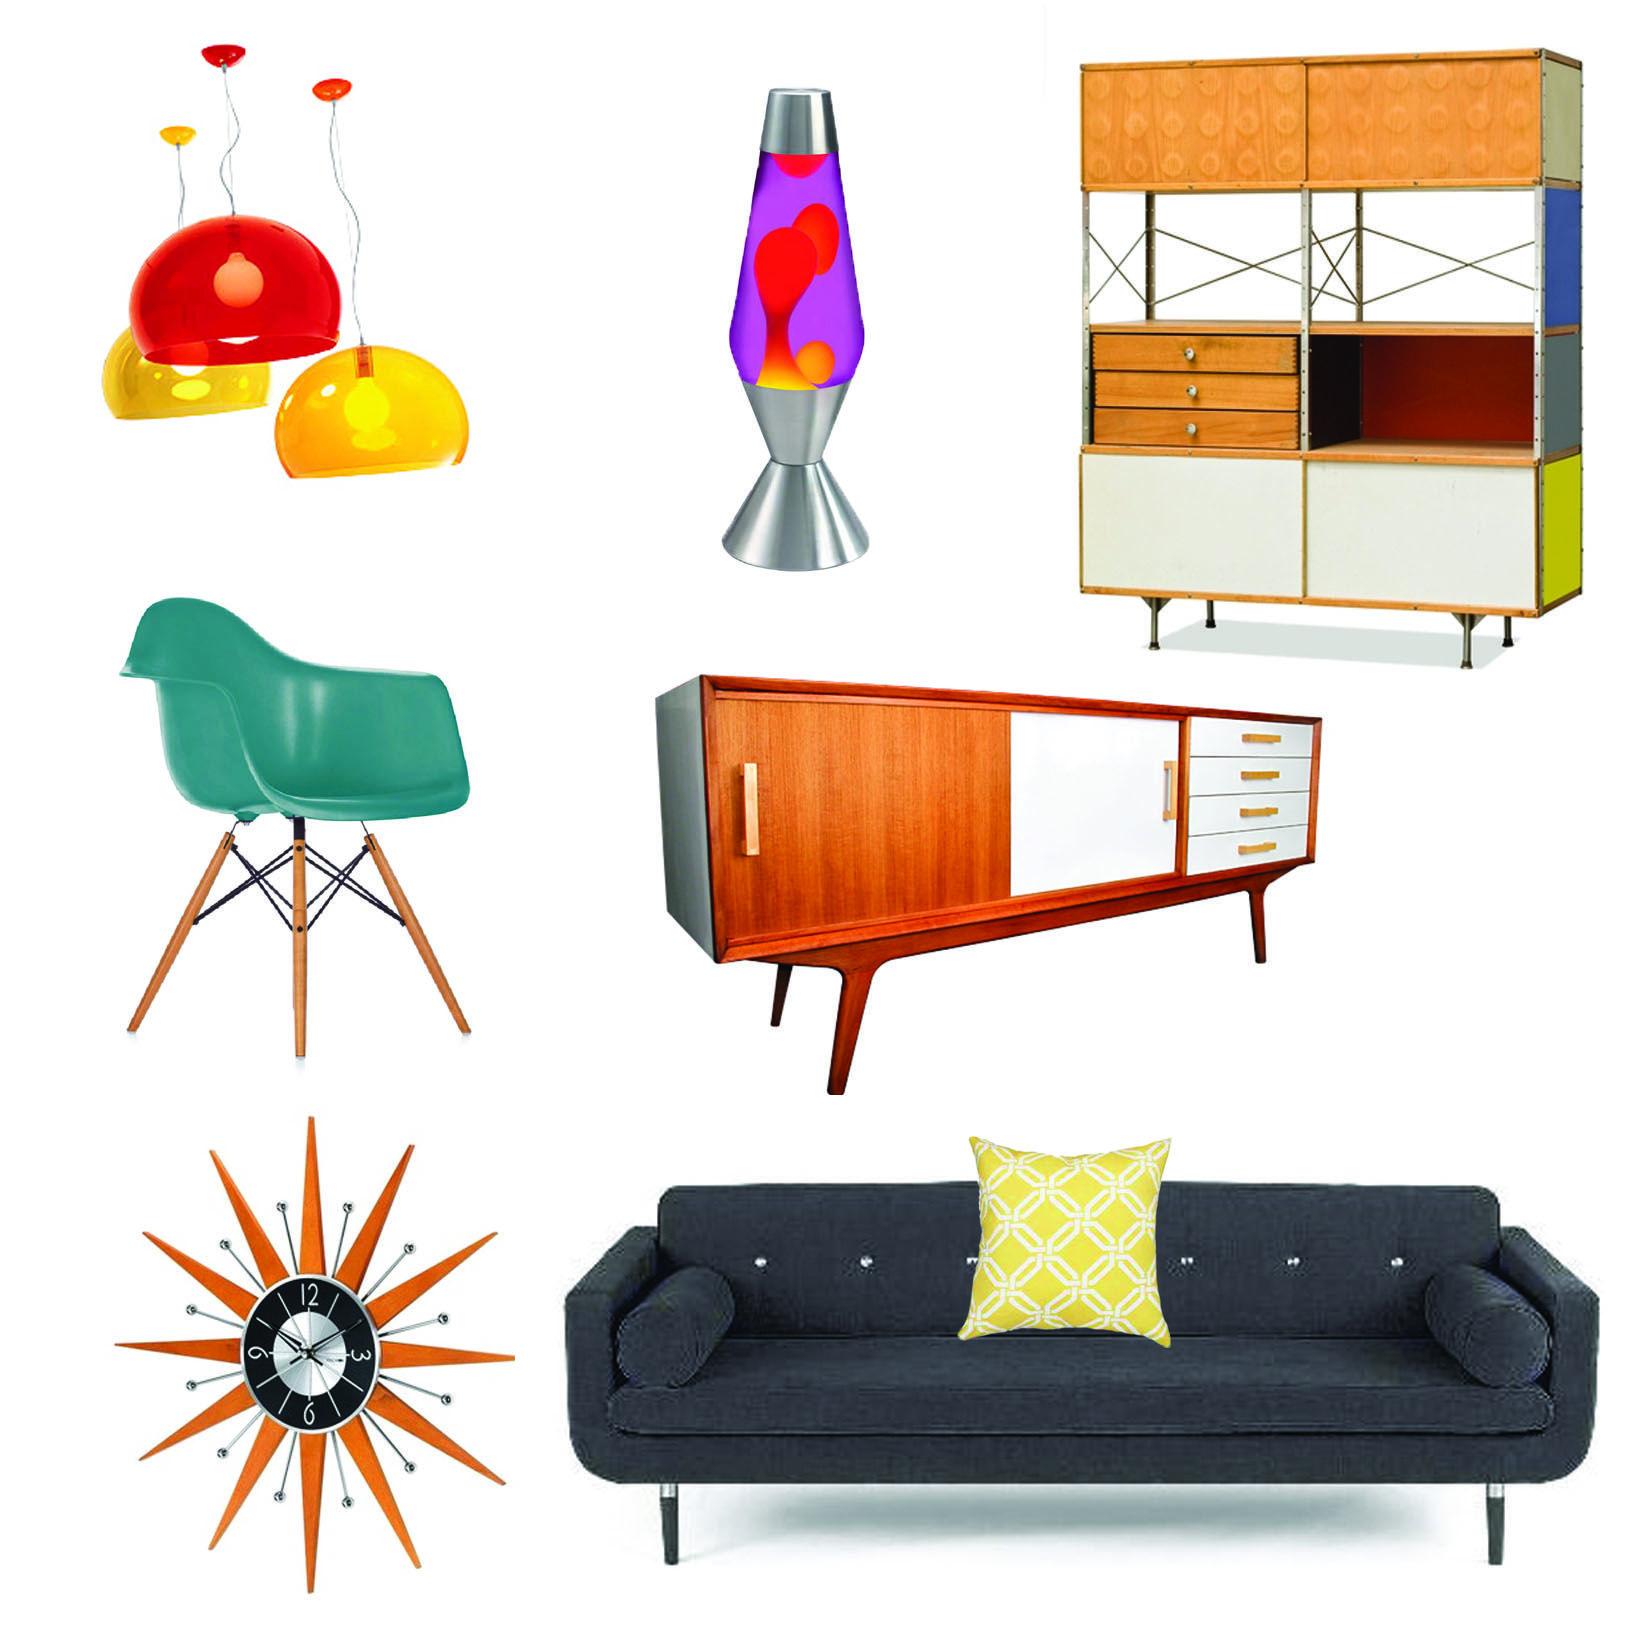 Decorating A Contemporary Living Room Uses Retro Furniture: Chic Designer  Interiors Art Deco Game Accessories Upholstery Fabric Chic Retro Cane Retro  Retro ...